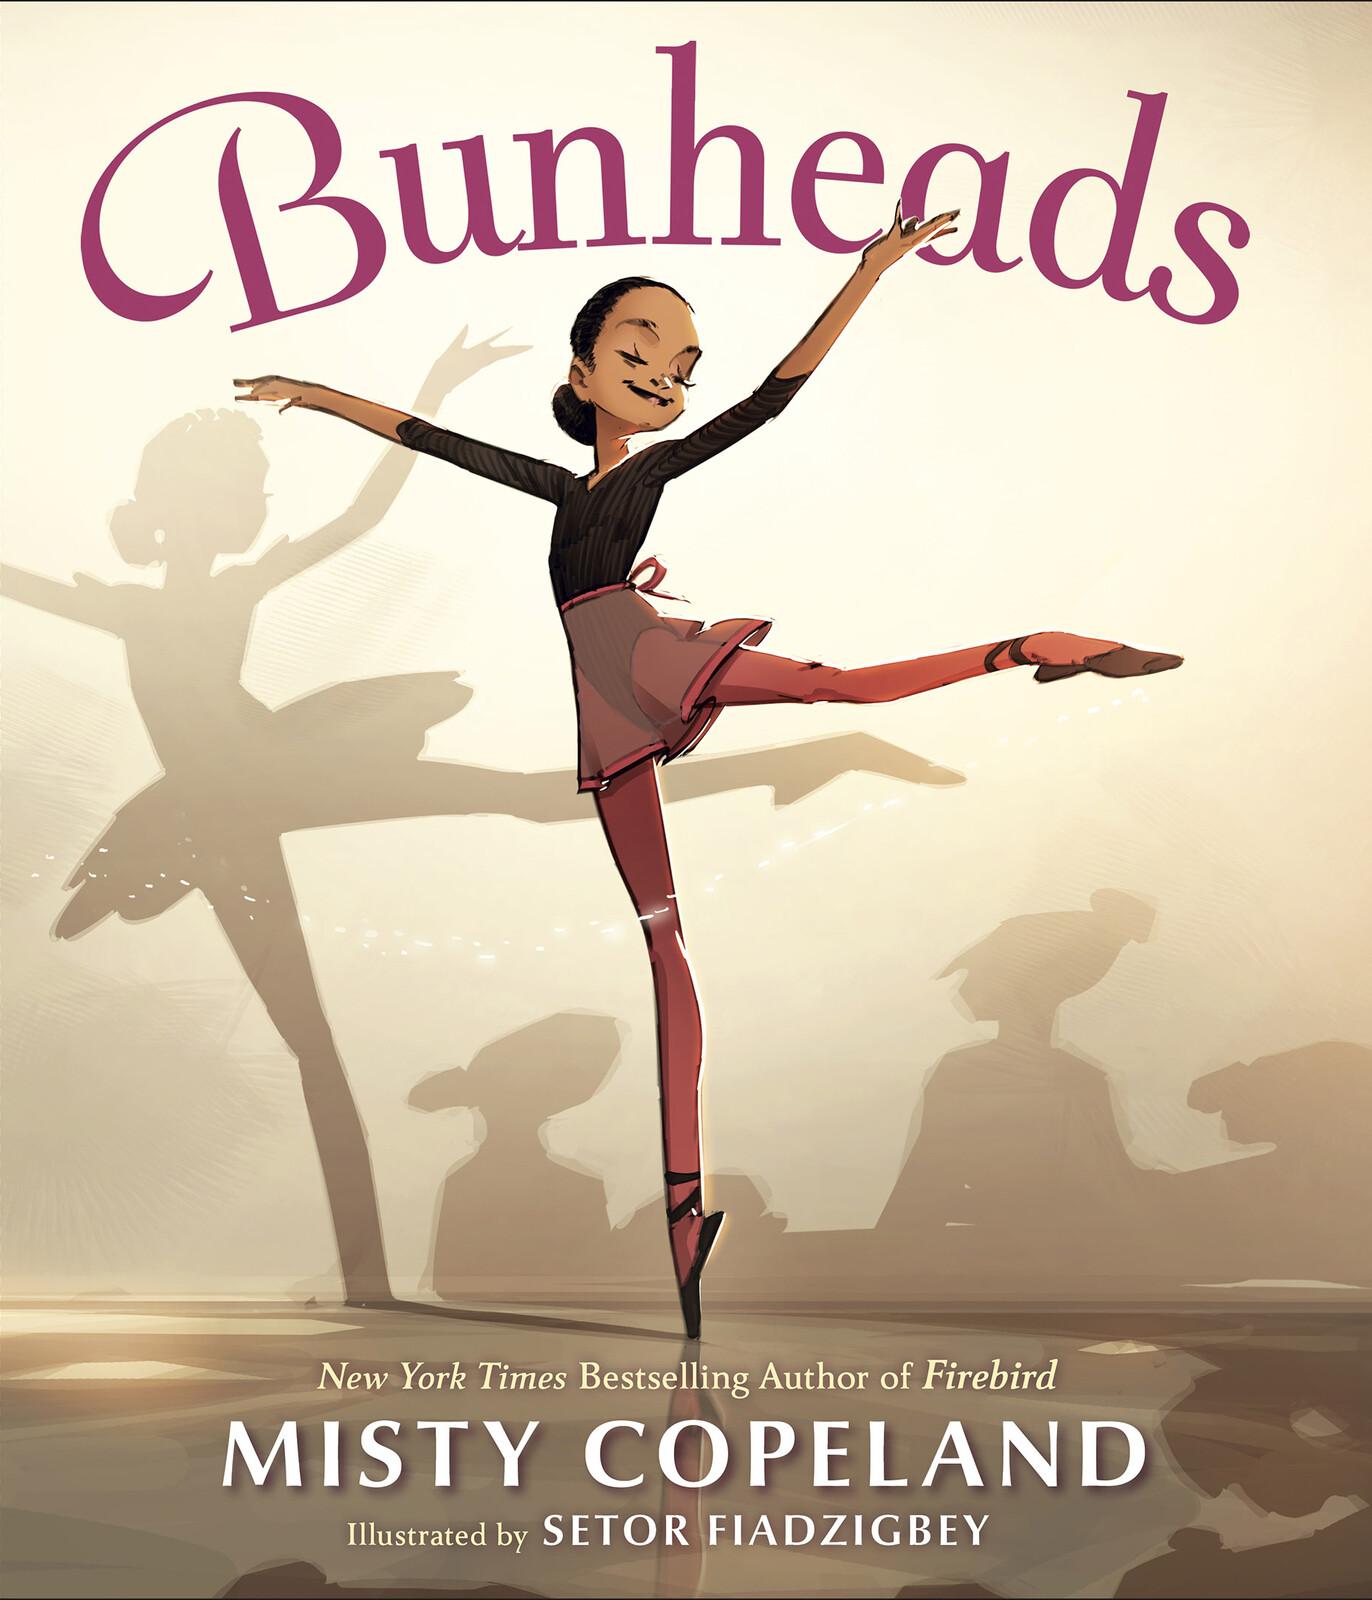 Bunheads Picture Book